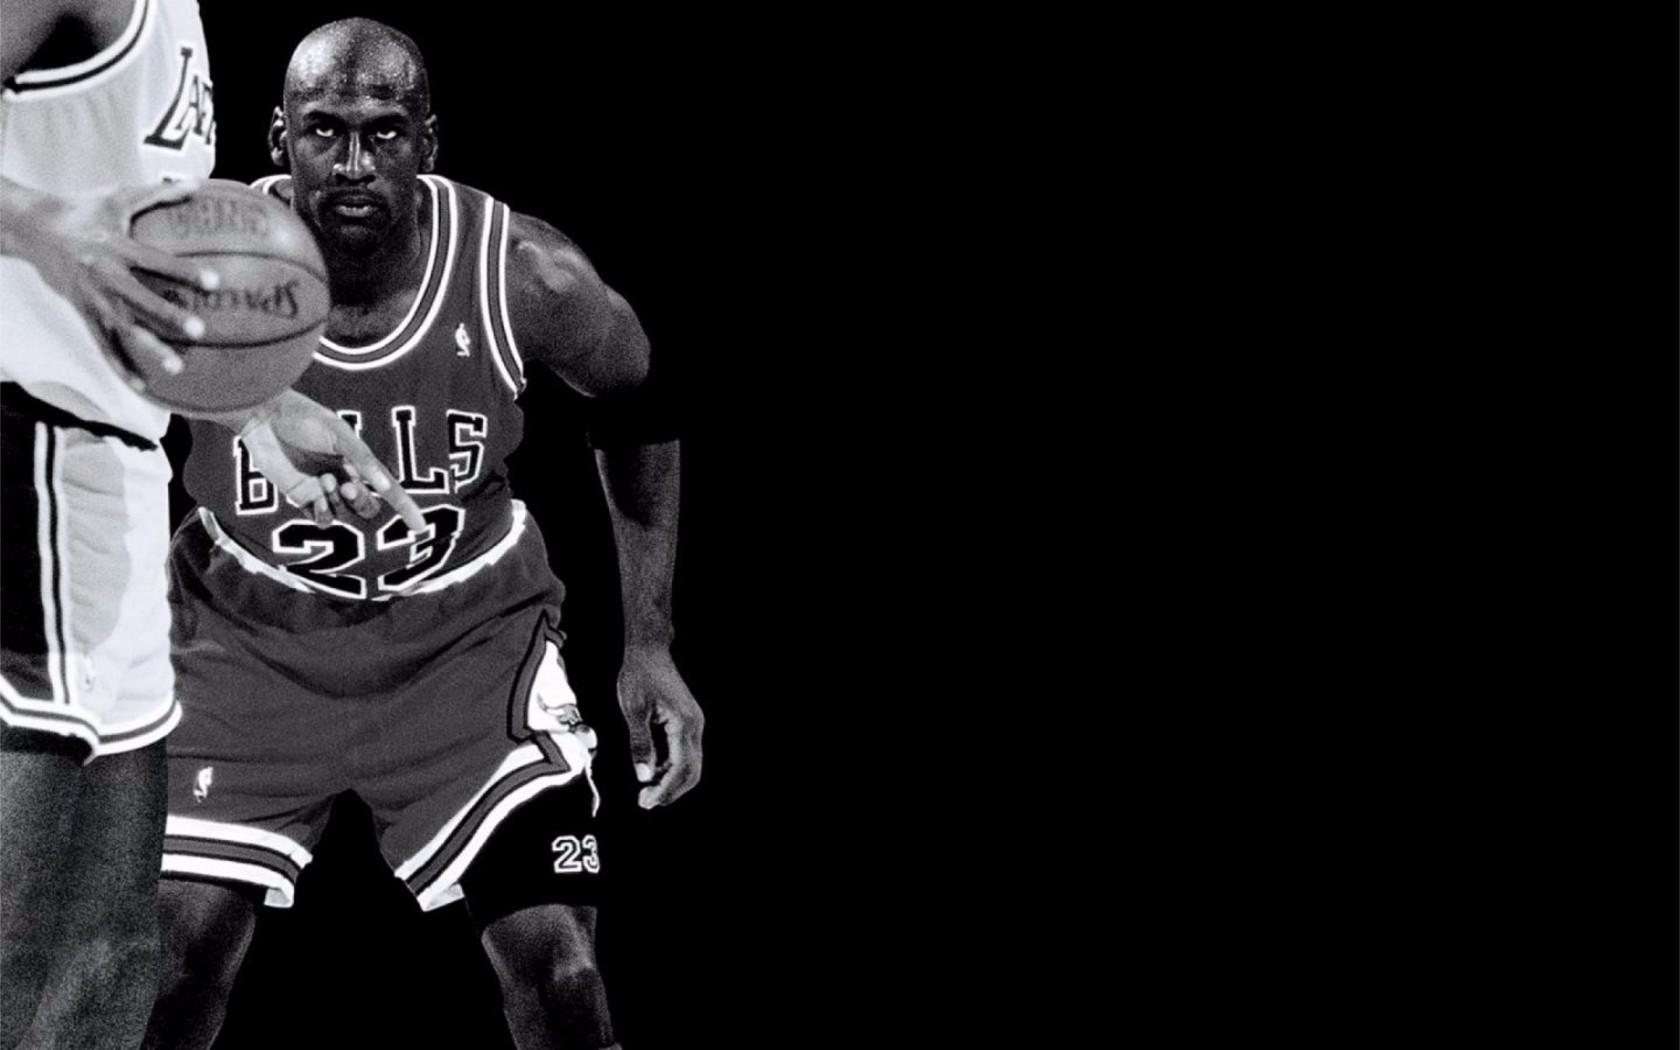 Black and White Michael Jordan 4K Wallpaper 4K Wallpaper 1680x1050